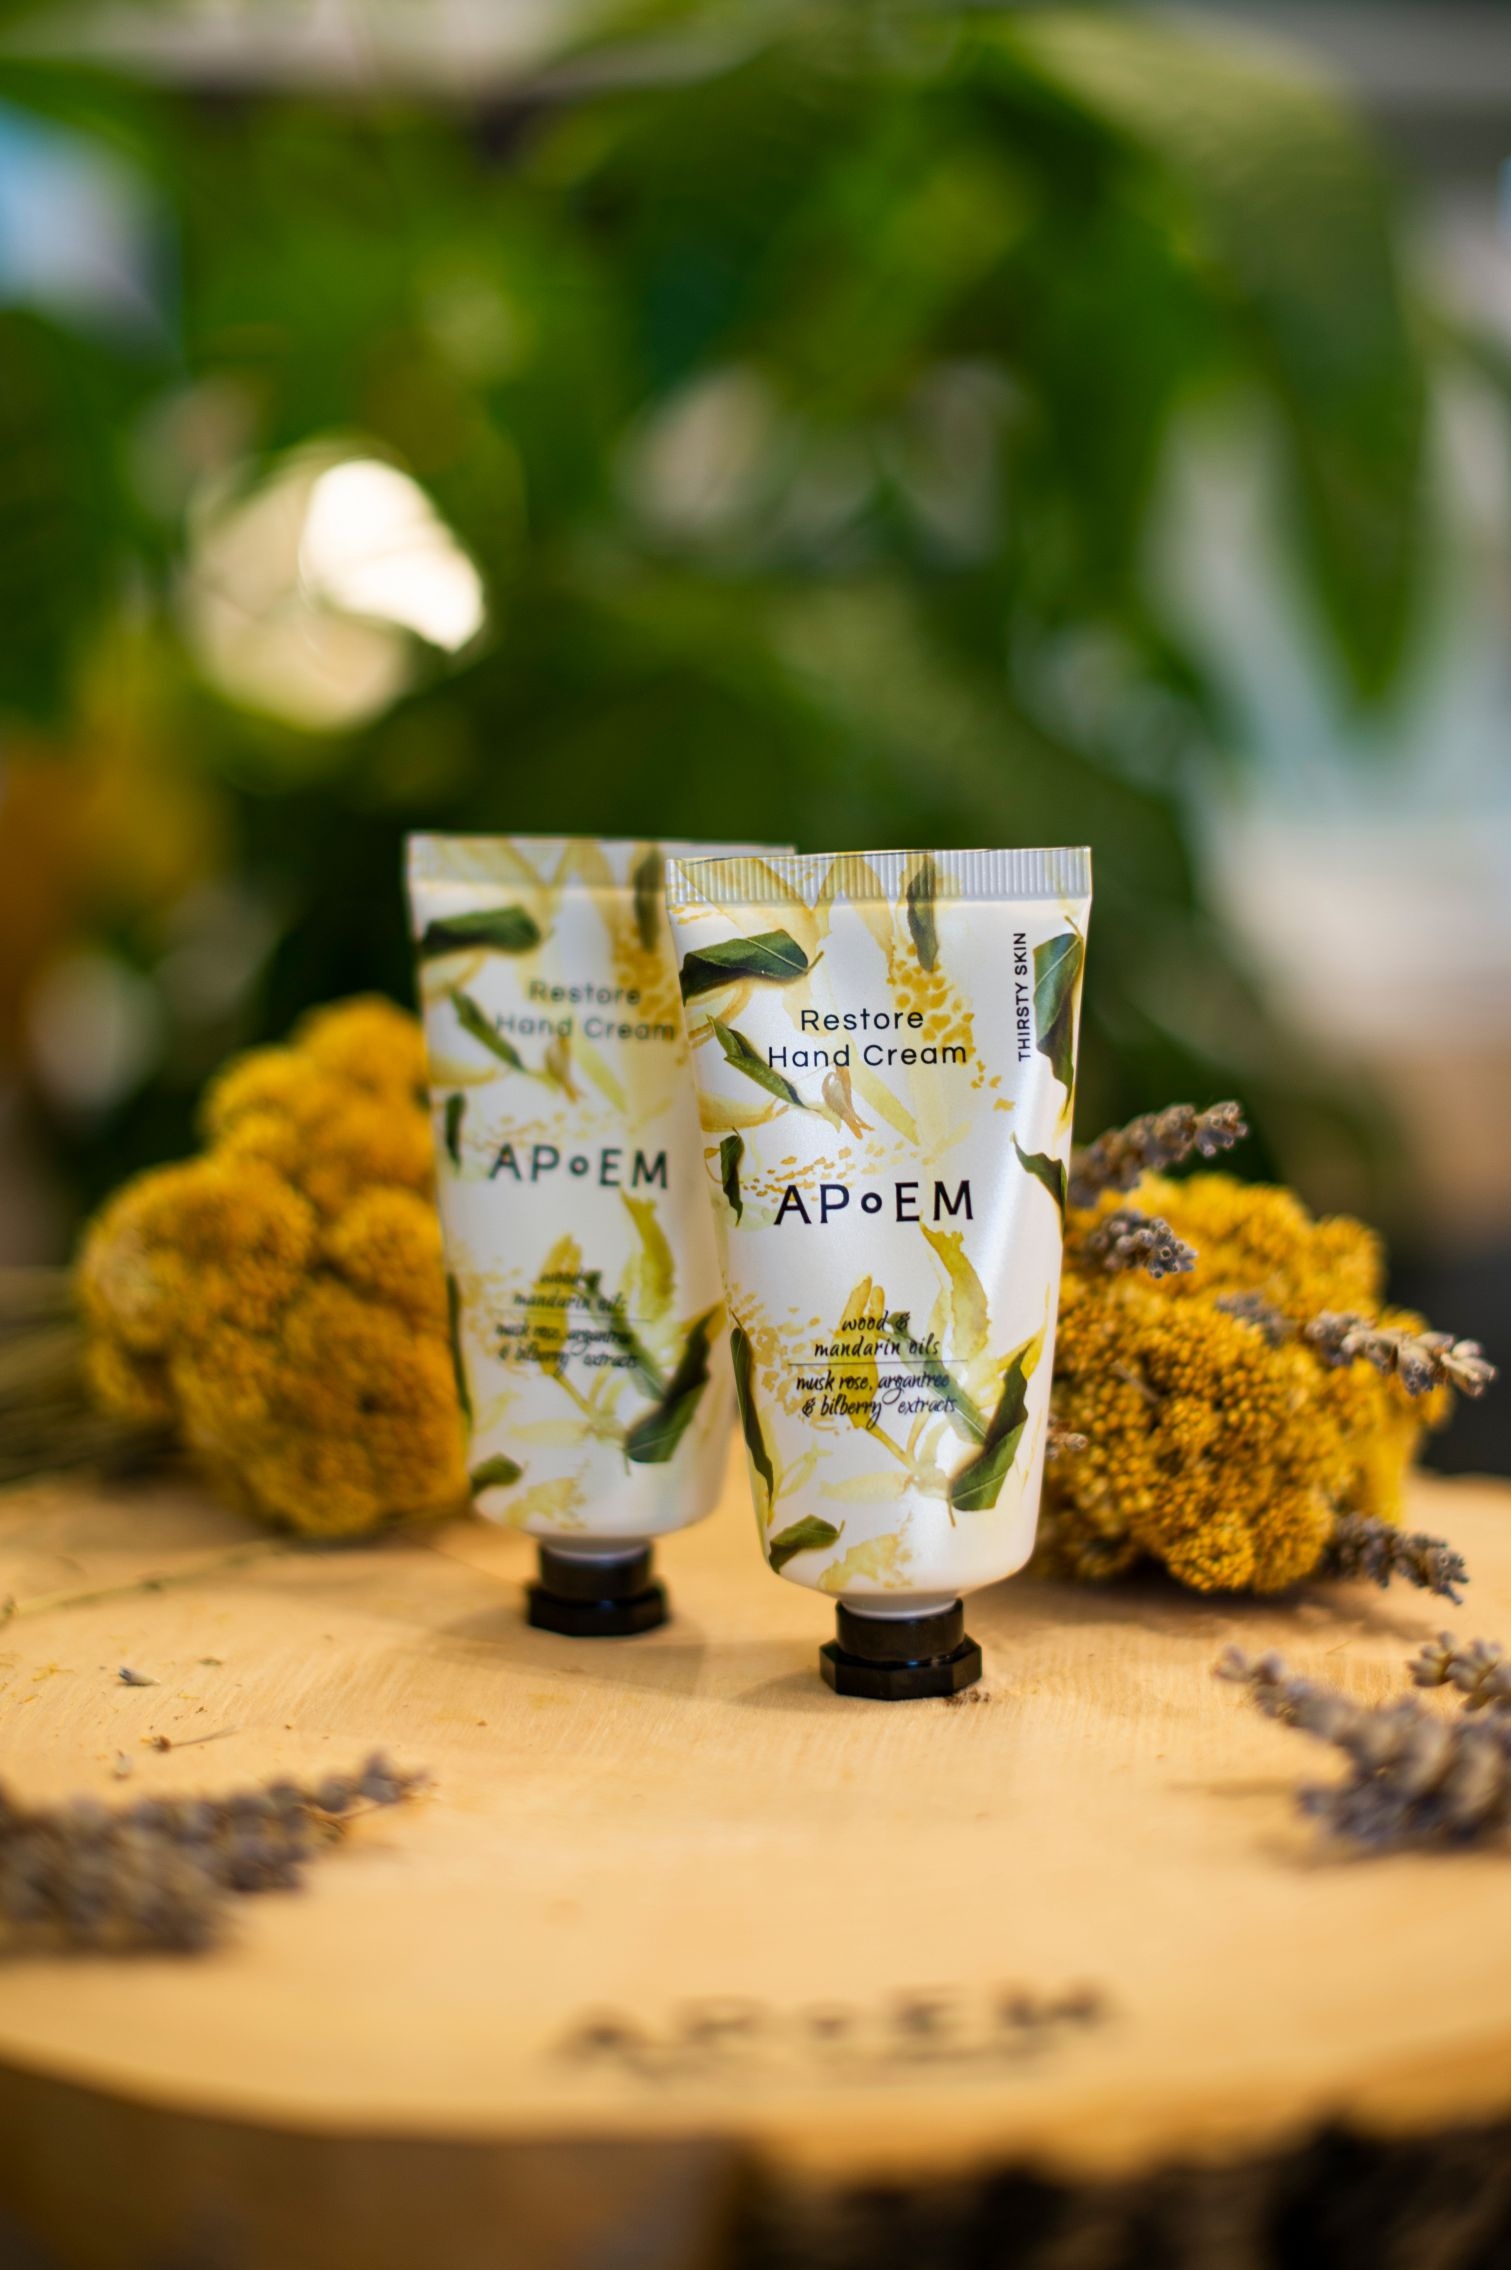 apoem clean beauty hand cream